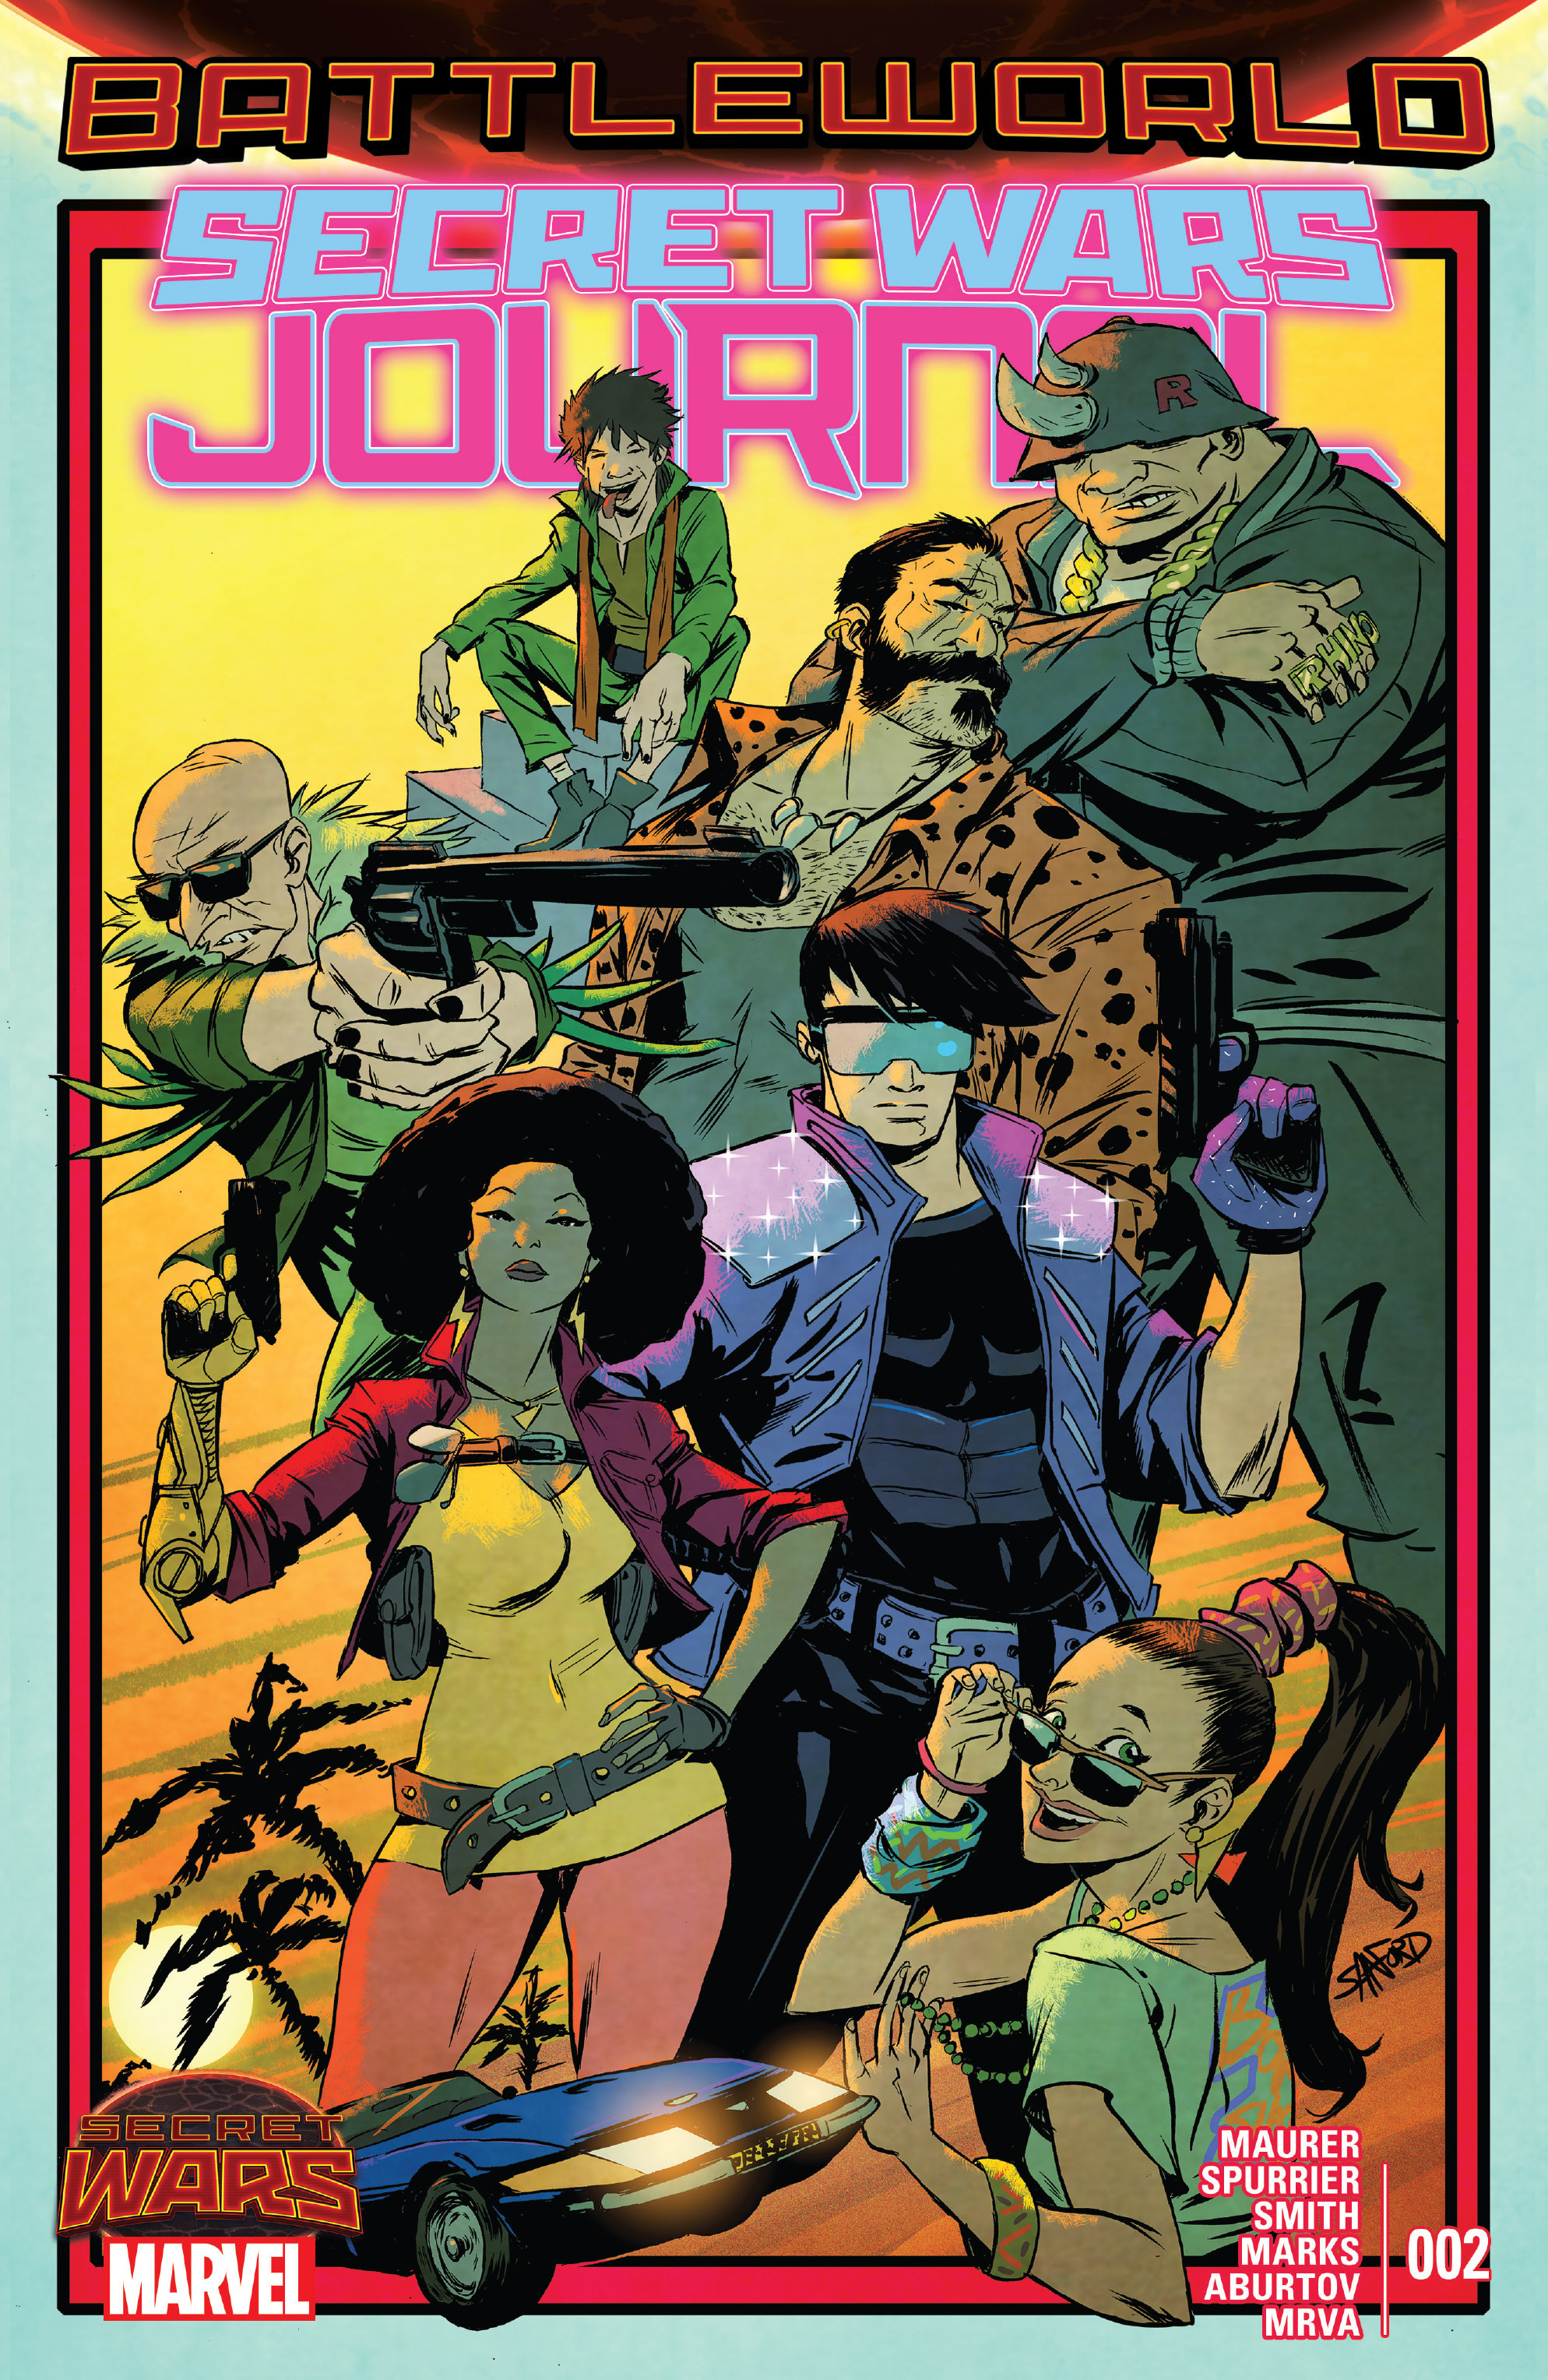 Read online Secret Wars Journal/Battleworld comic -  Issue # TPB - 25